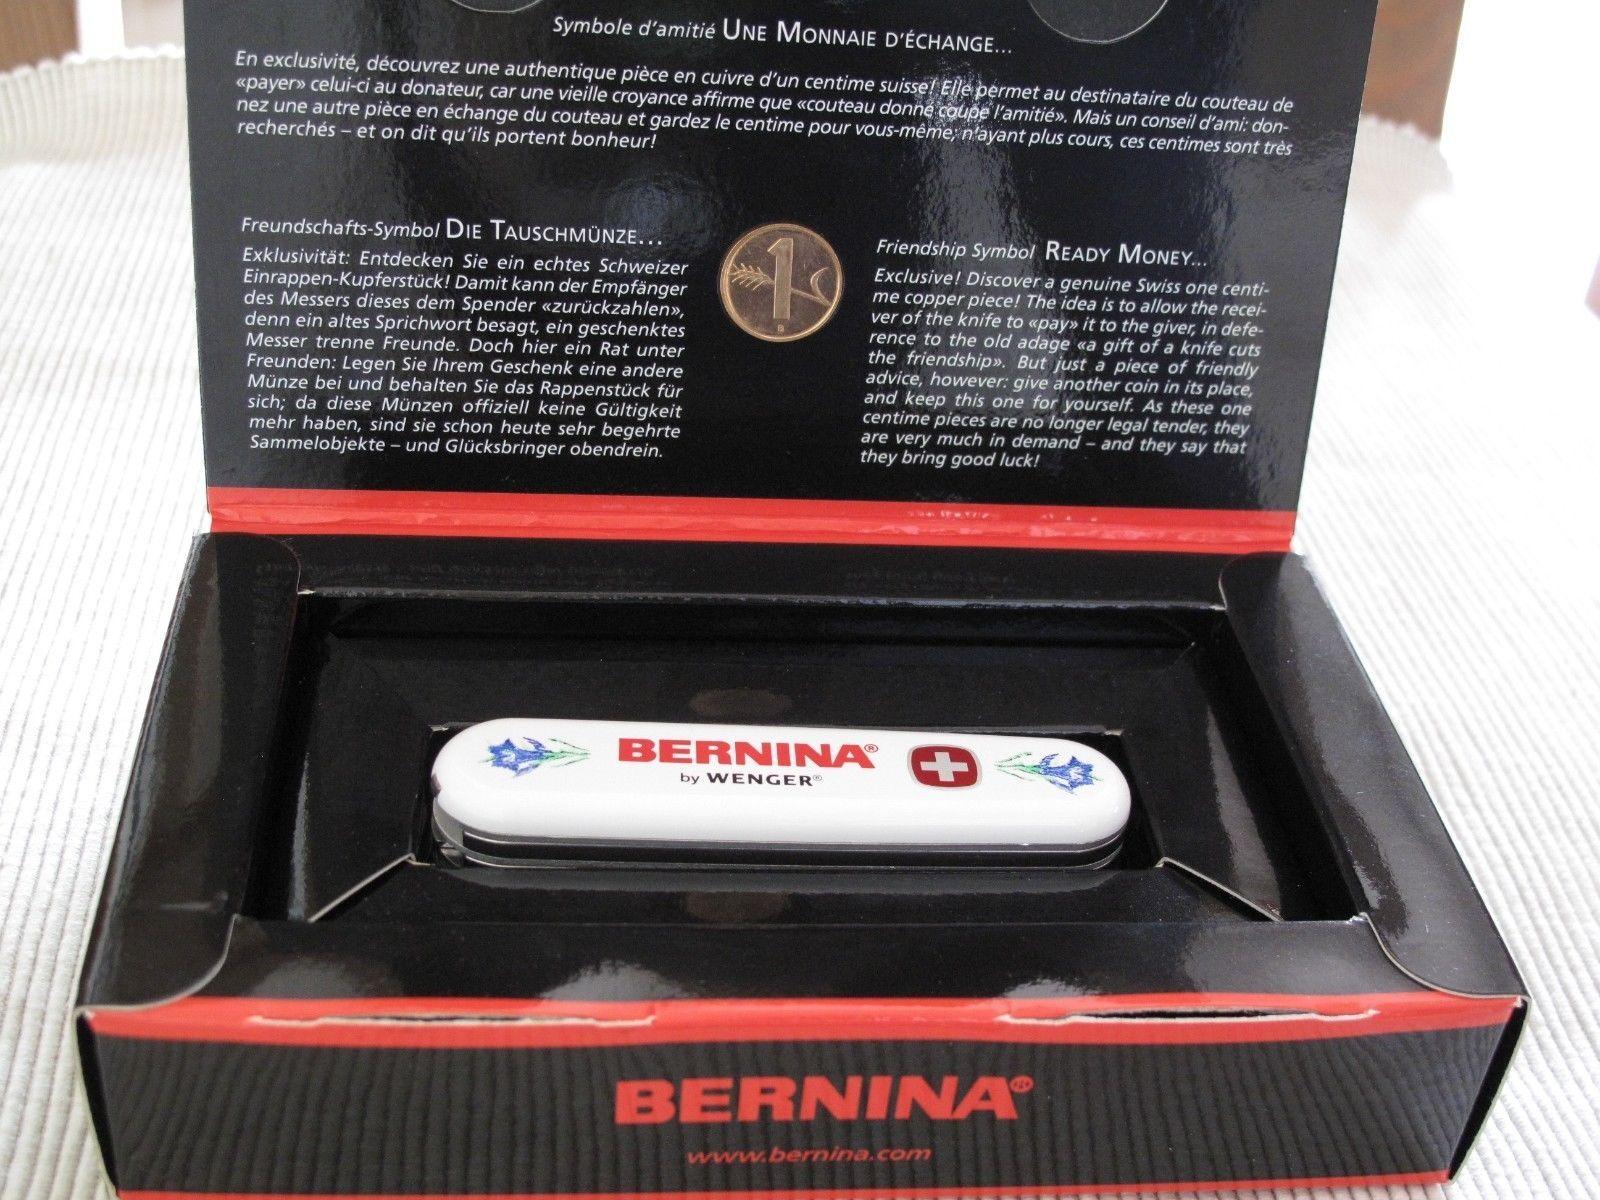 Swiss Army Knife Wenger Bernina Rare Ebay Sewing Tools